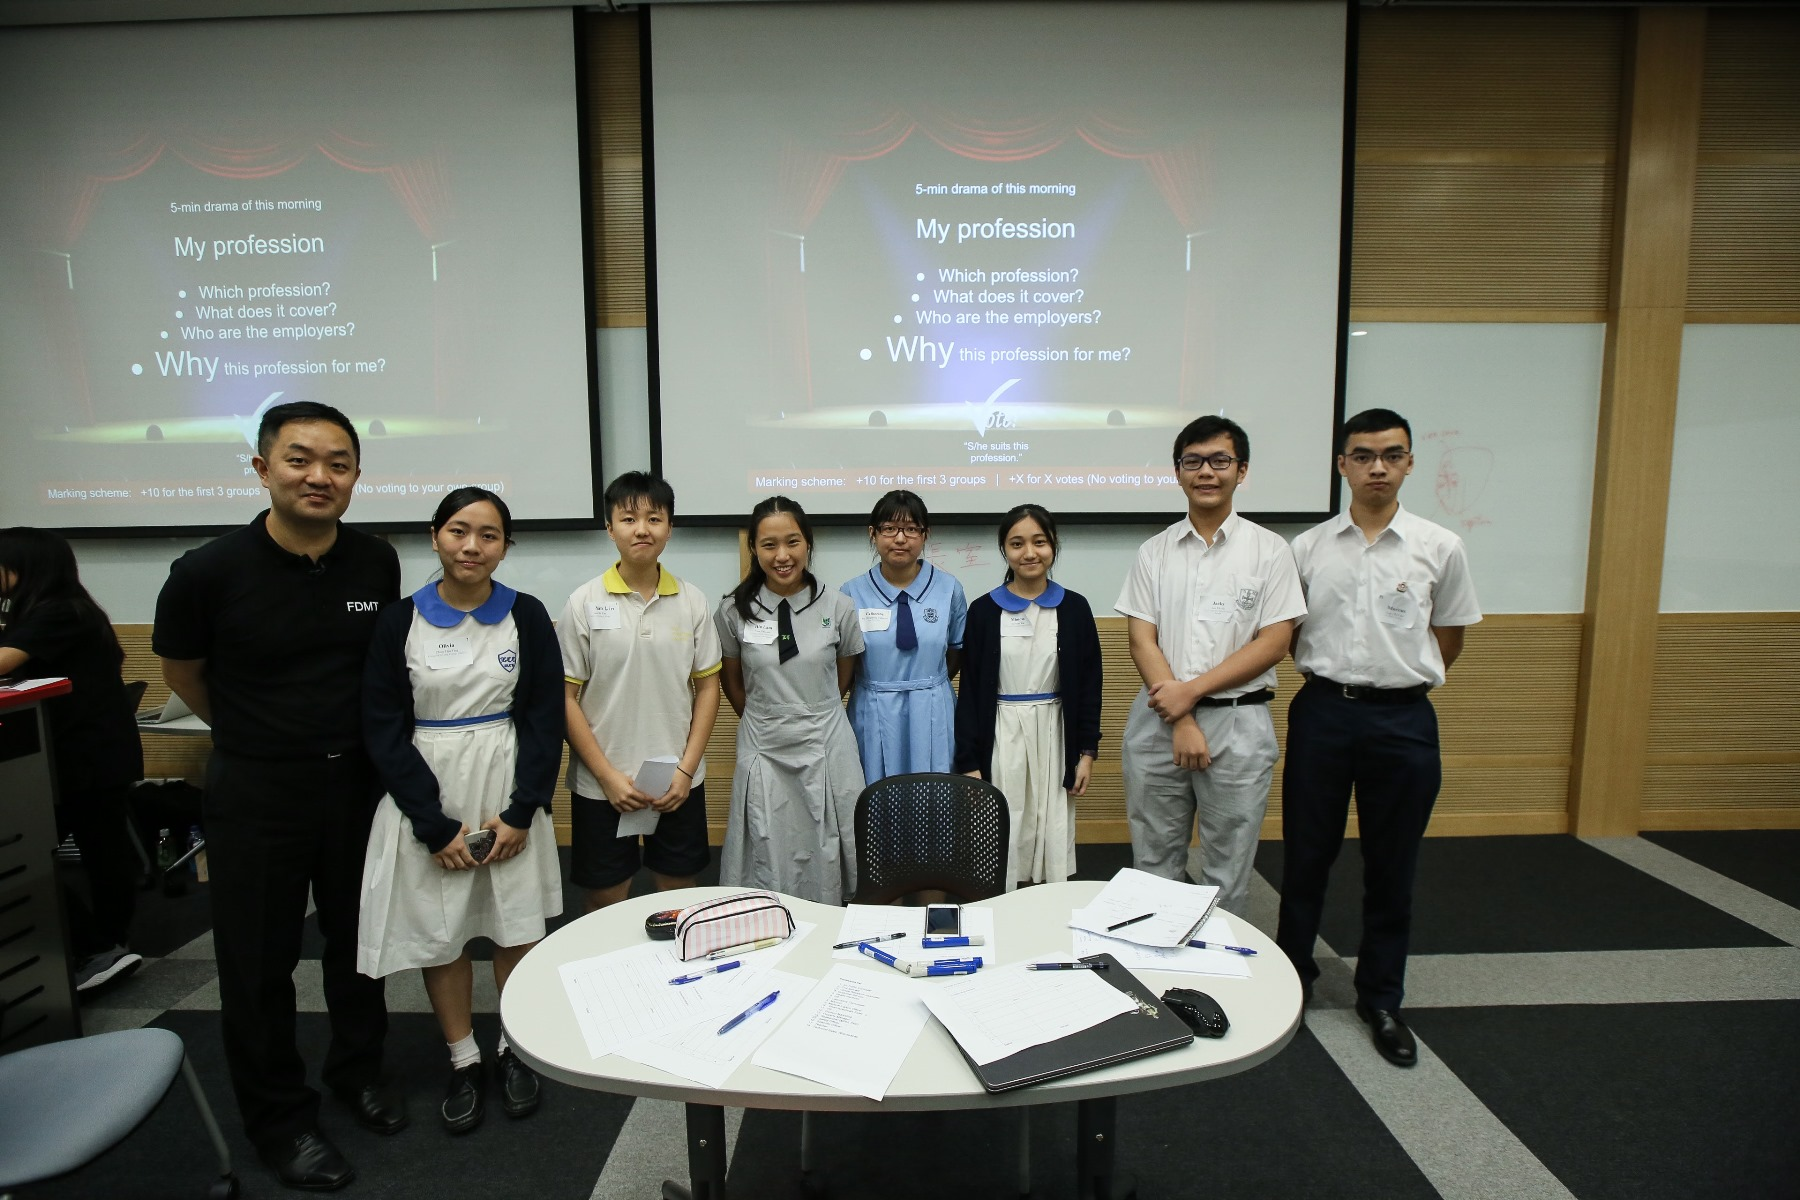 http://www.npc.edu.hk/sites/default/files/img_2634.jpg